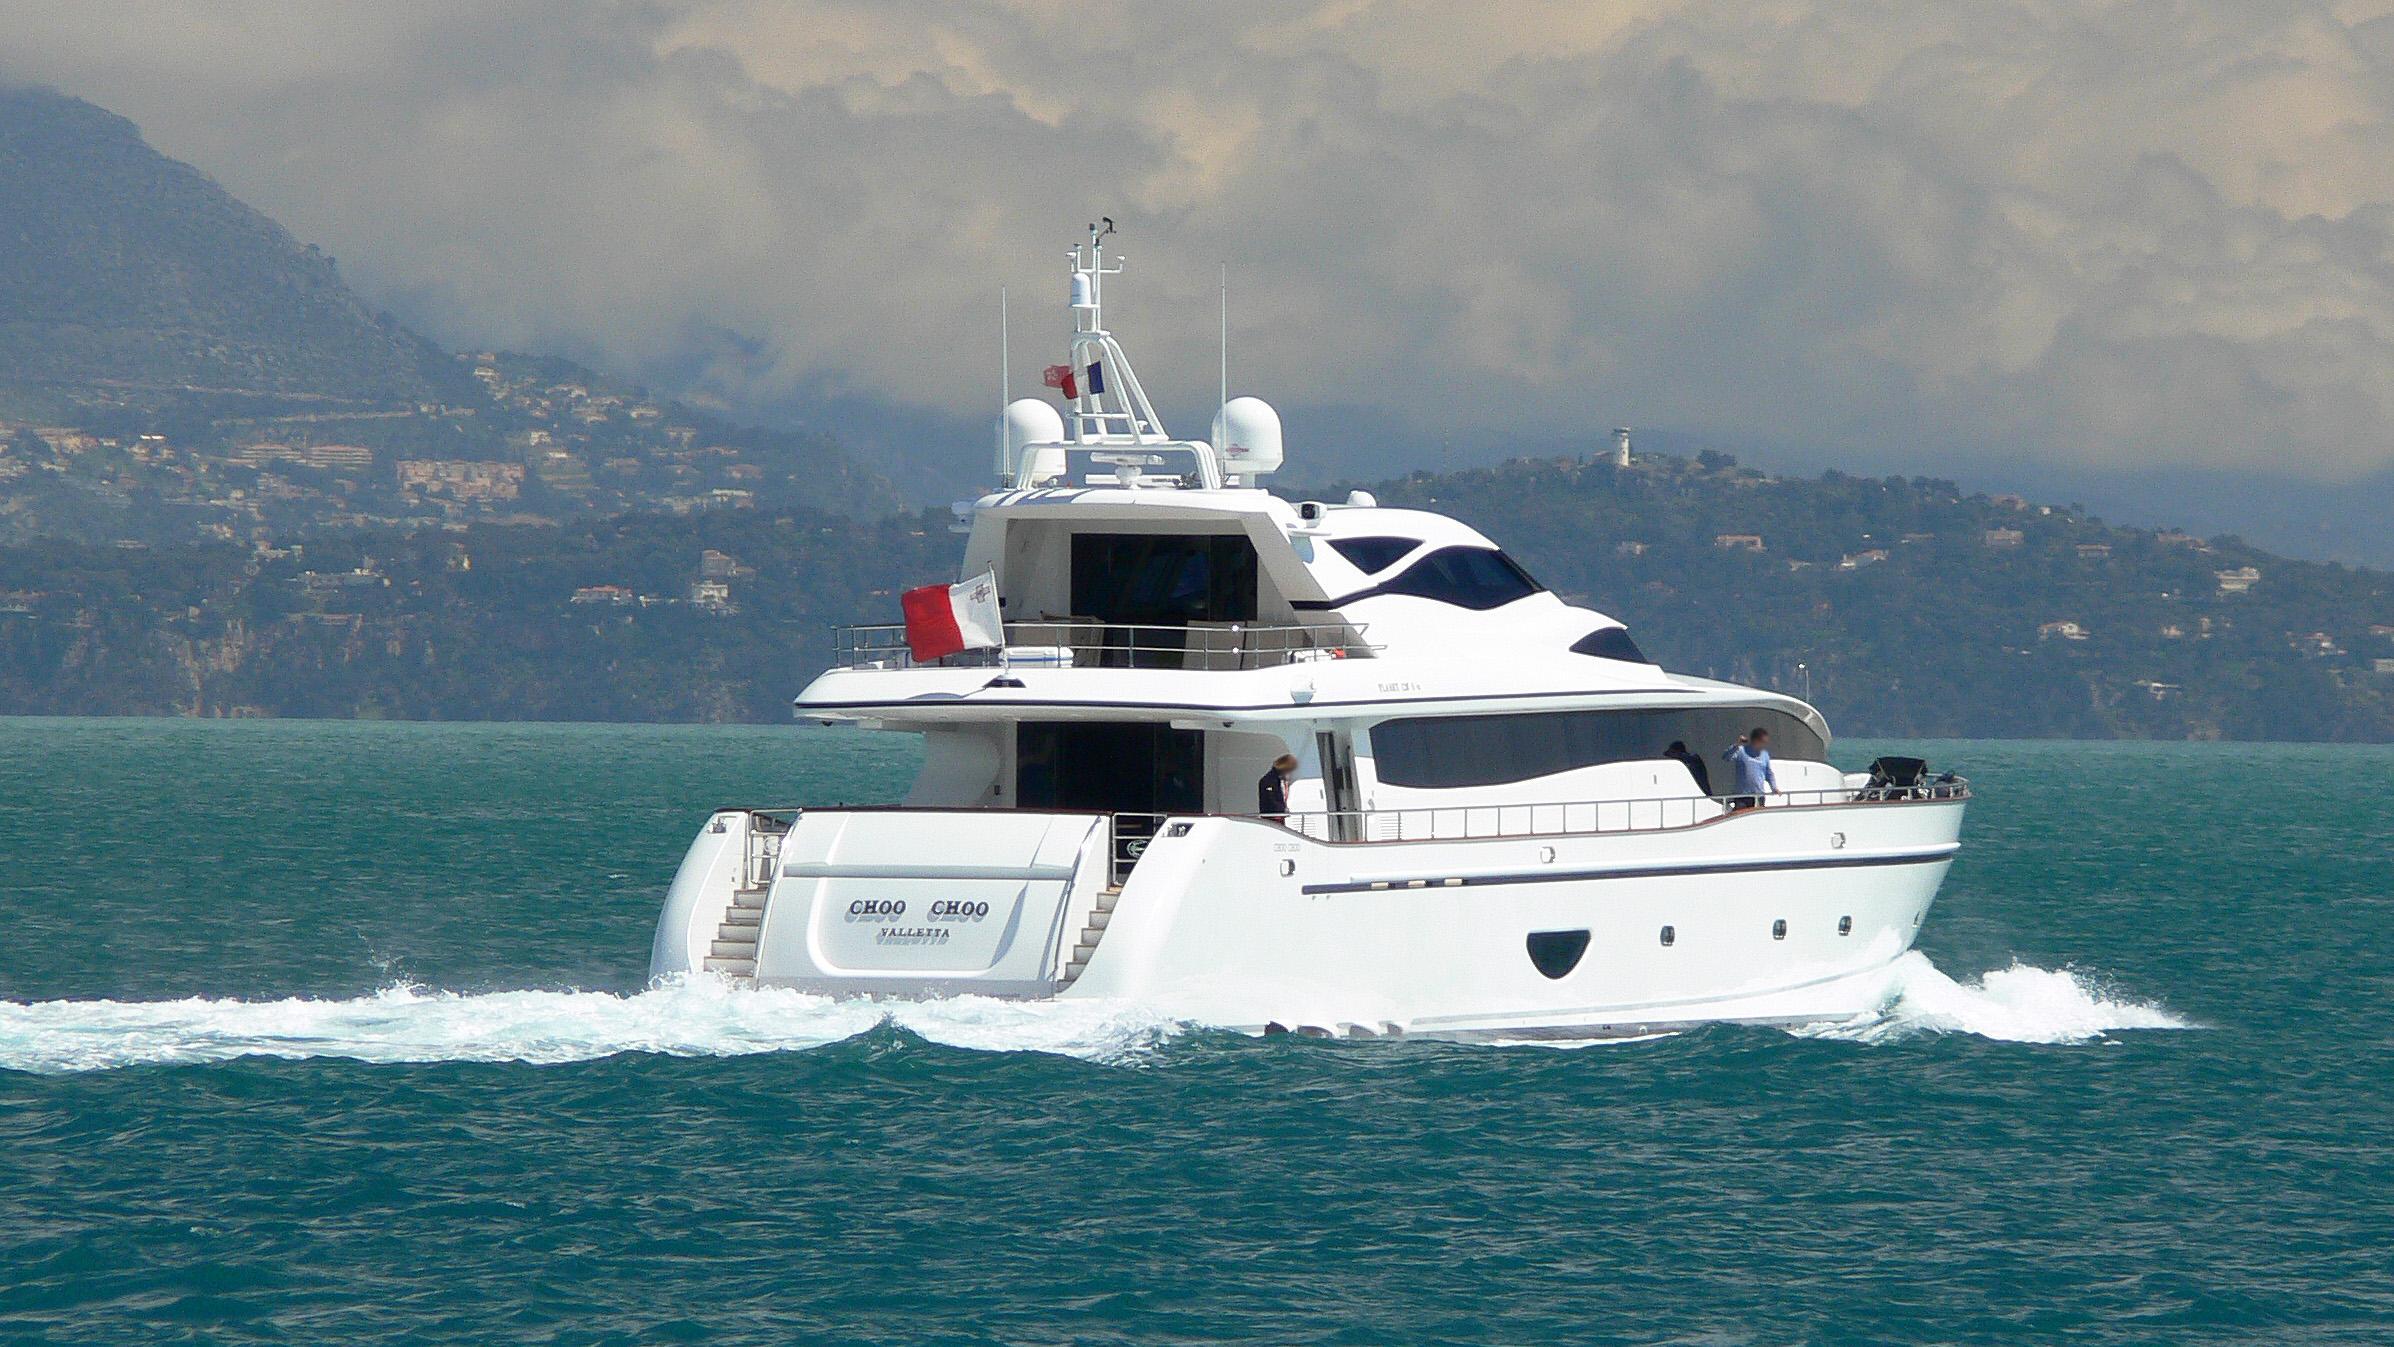 choo-choo-motor-yacht-new-versilcraft-2006-36m-running-stern